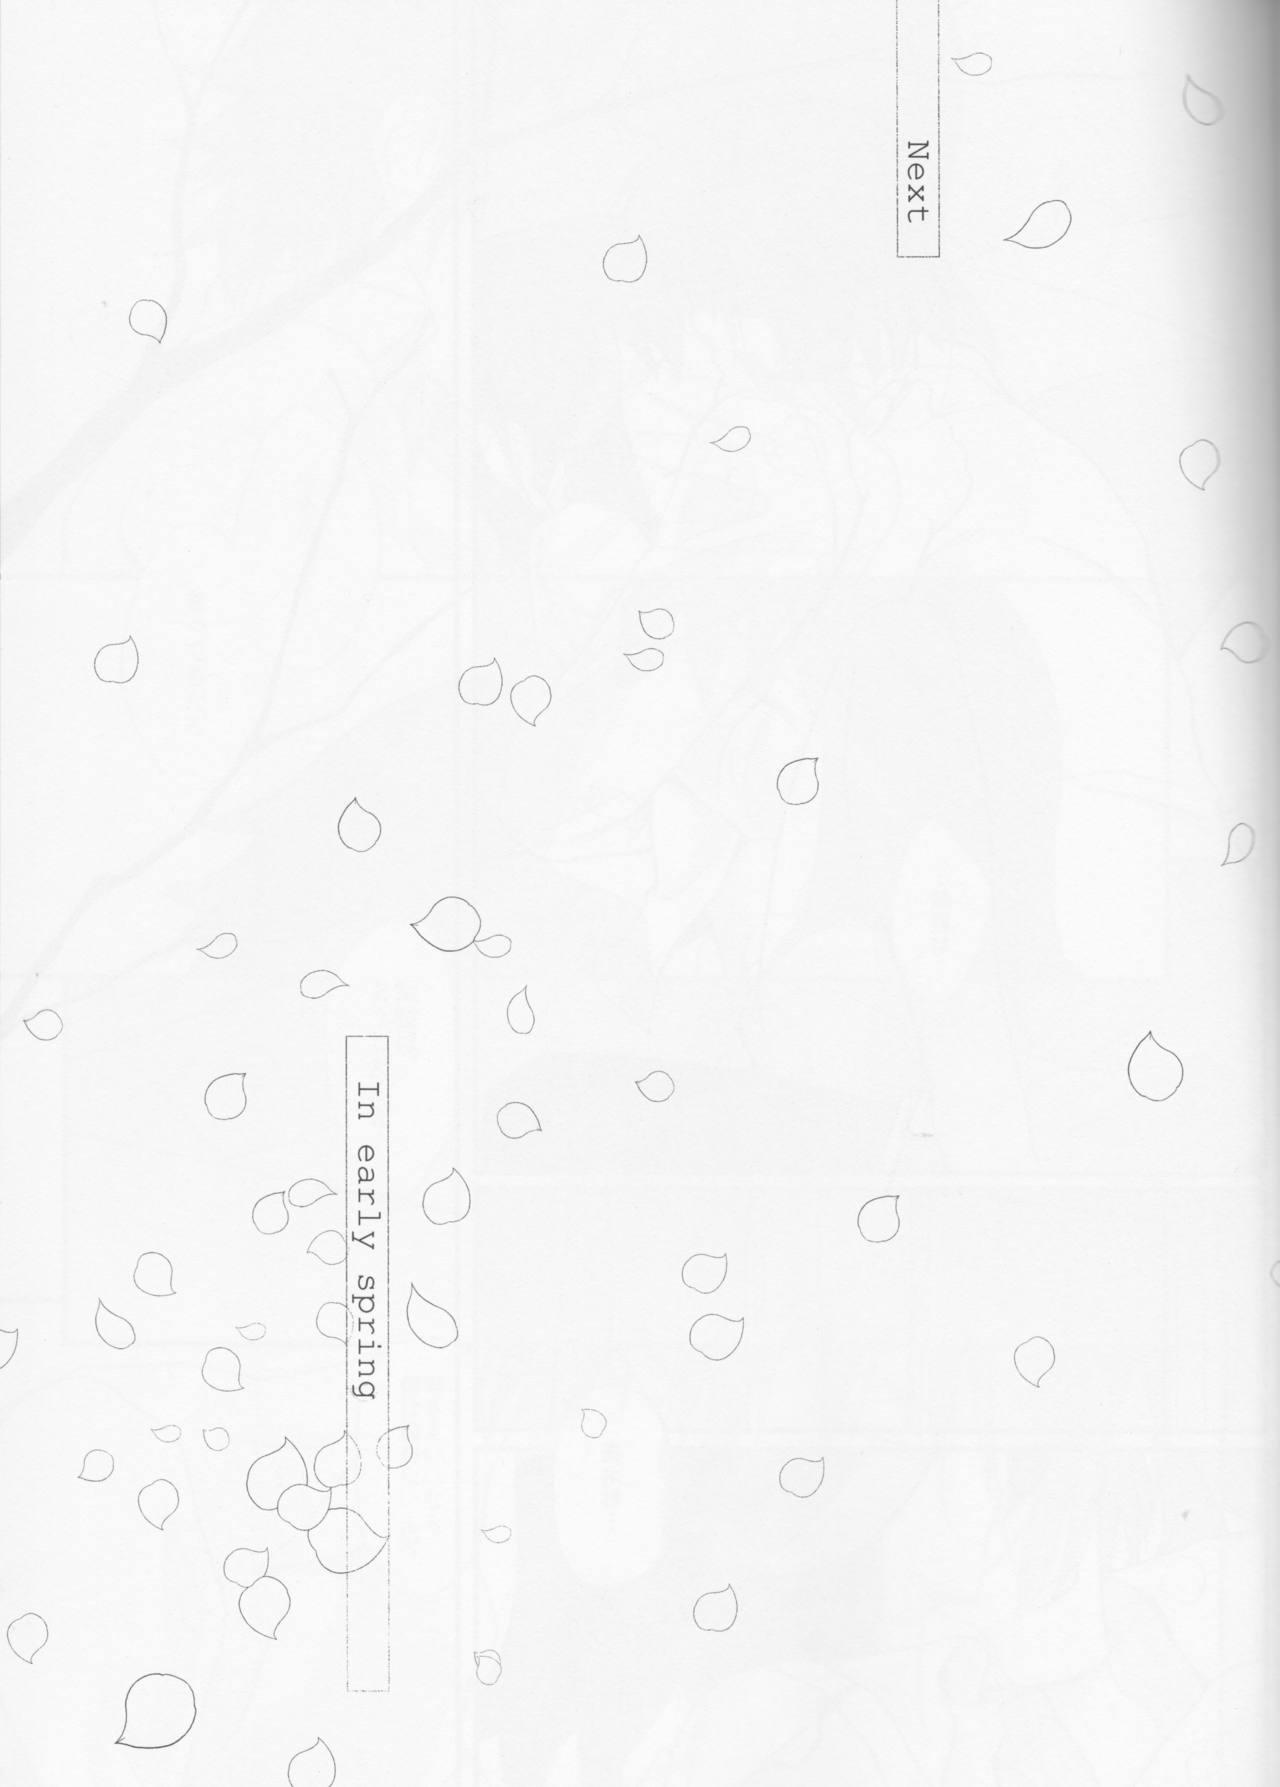 [Daylight (Ren Mizuha)]Usukurenaiiro no hana saku koro(Kill la Kill)) 13